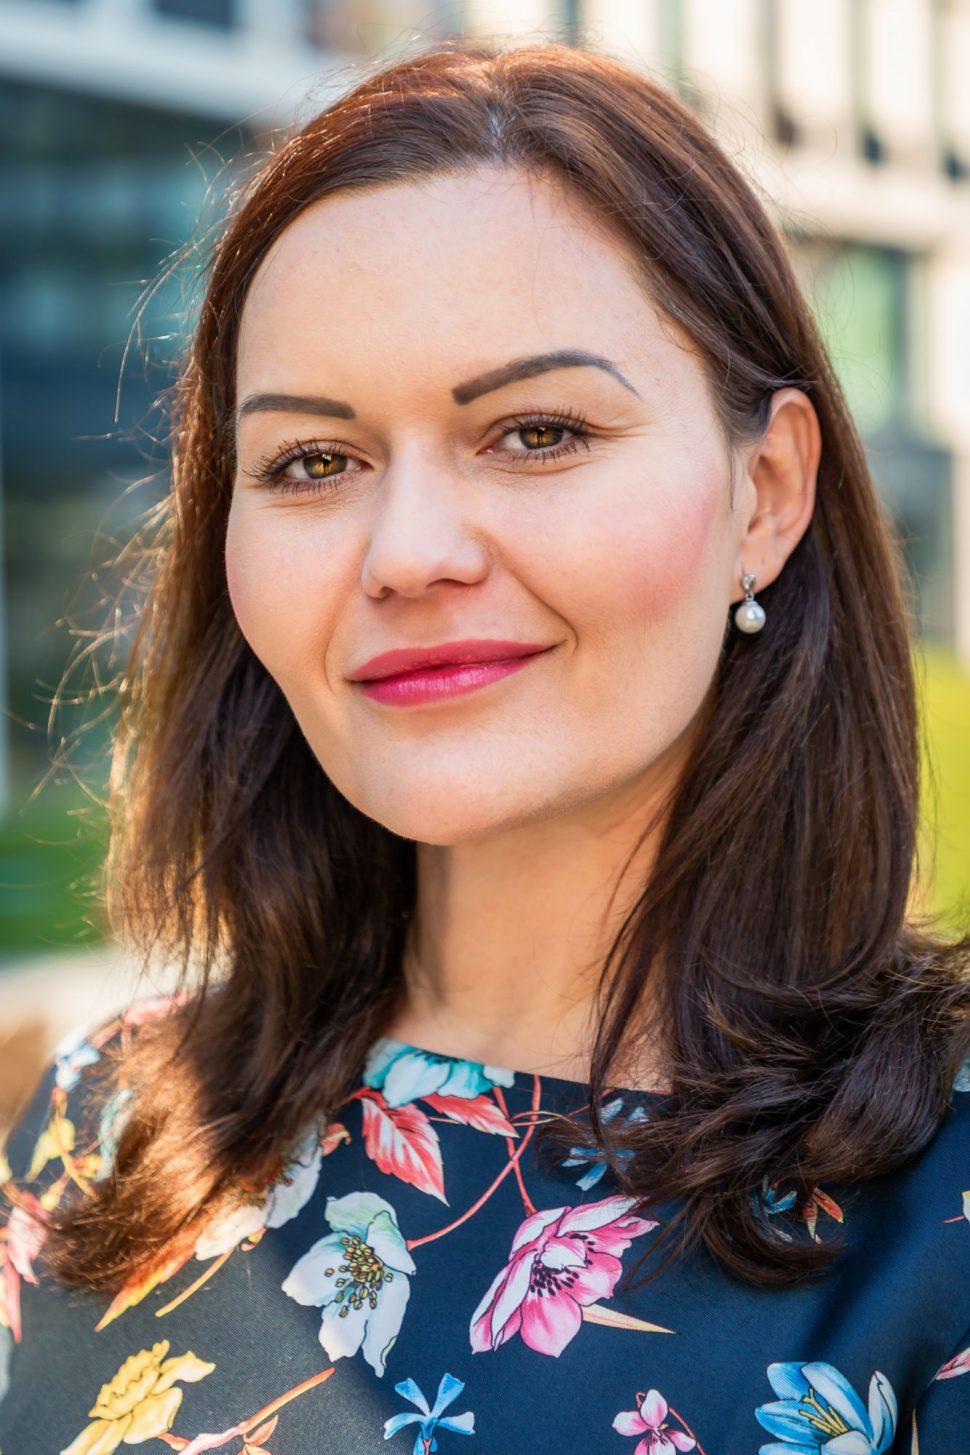 Broker Consulting, a.s., JUDr. Lenka Zelenáková